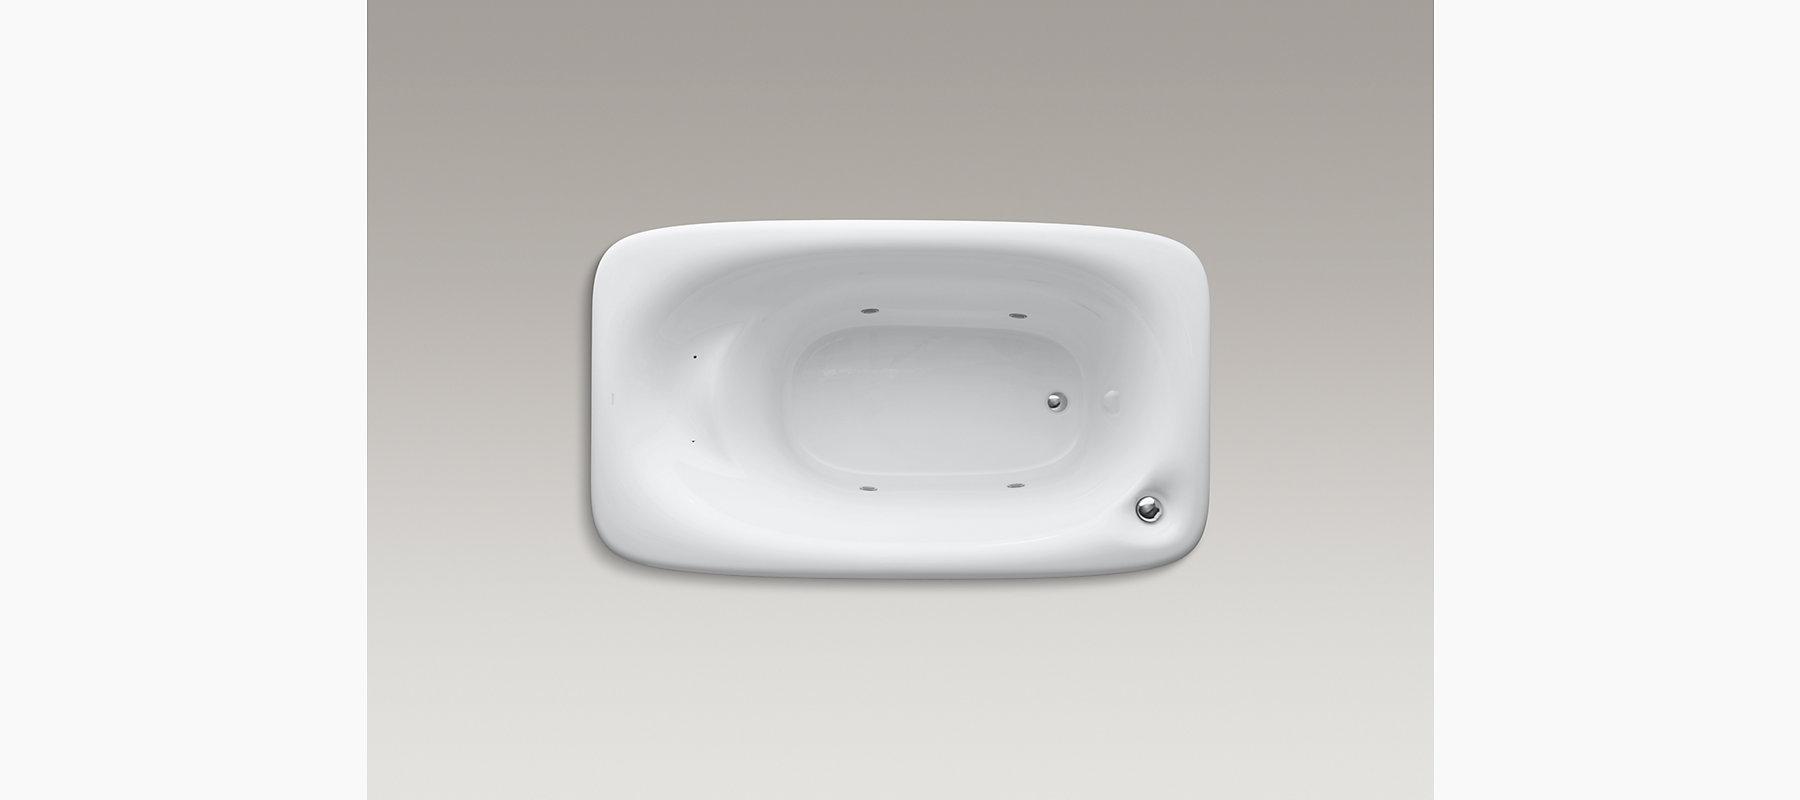 KOHLER| Fountainhead VibrAcoustic 6-Foot Bath with Right Drain | KOHLER